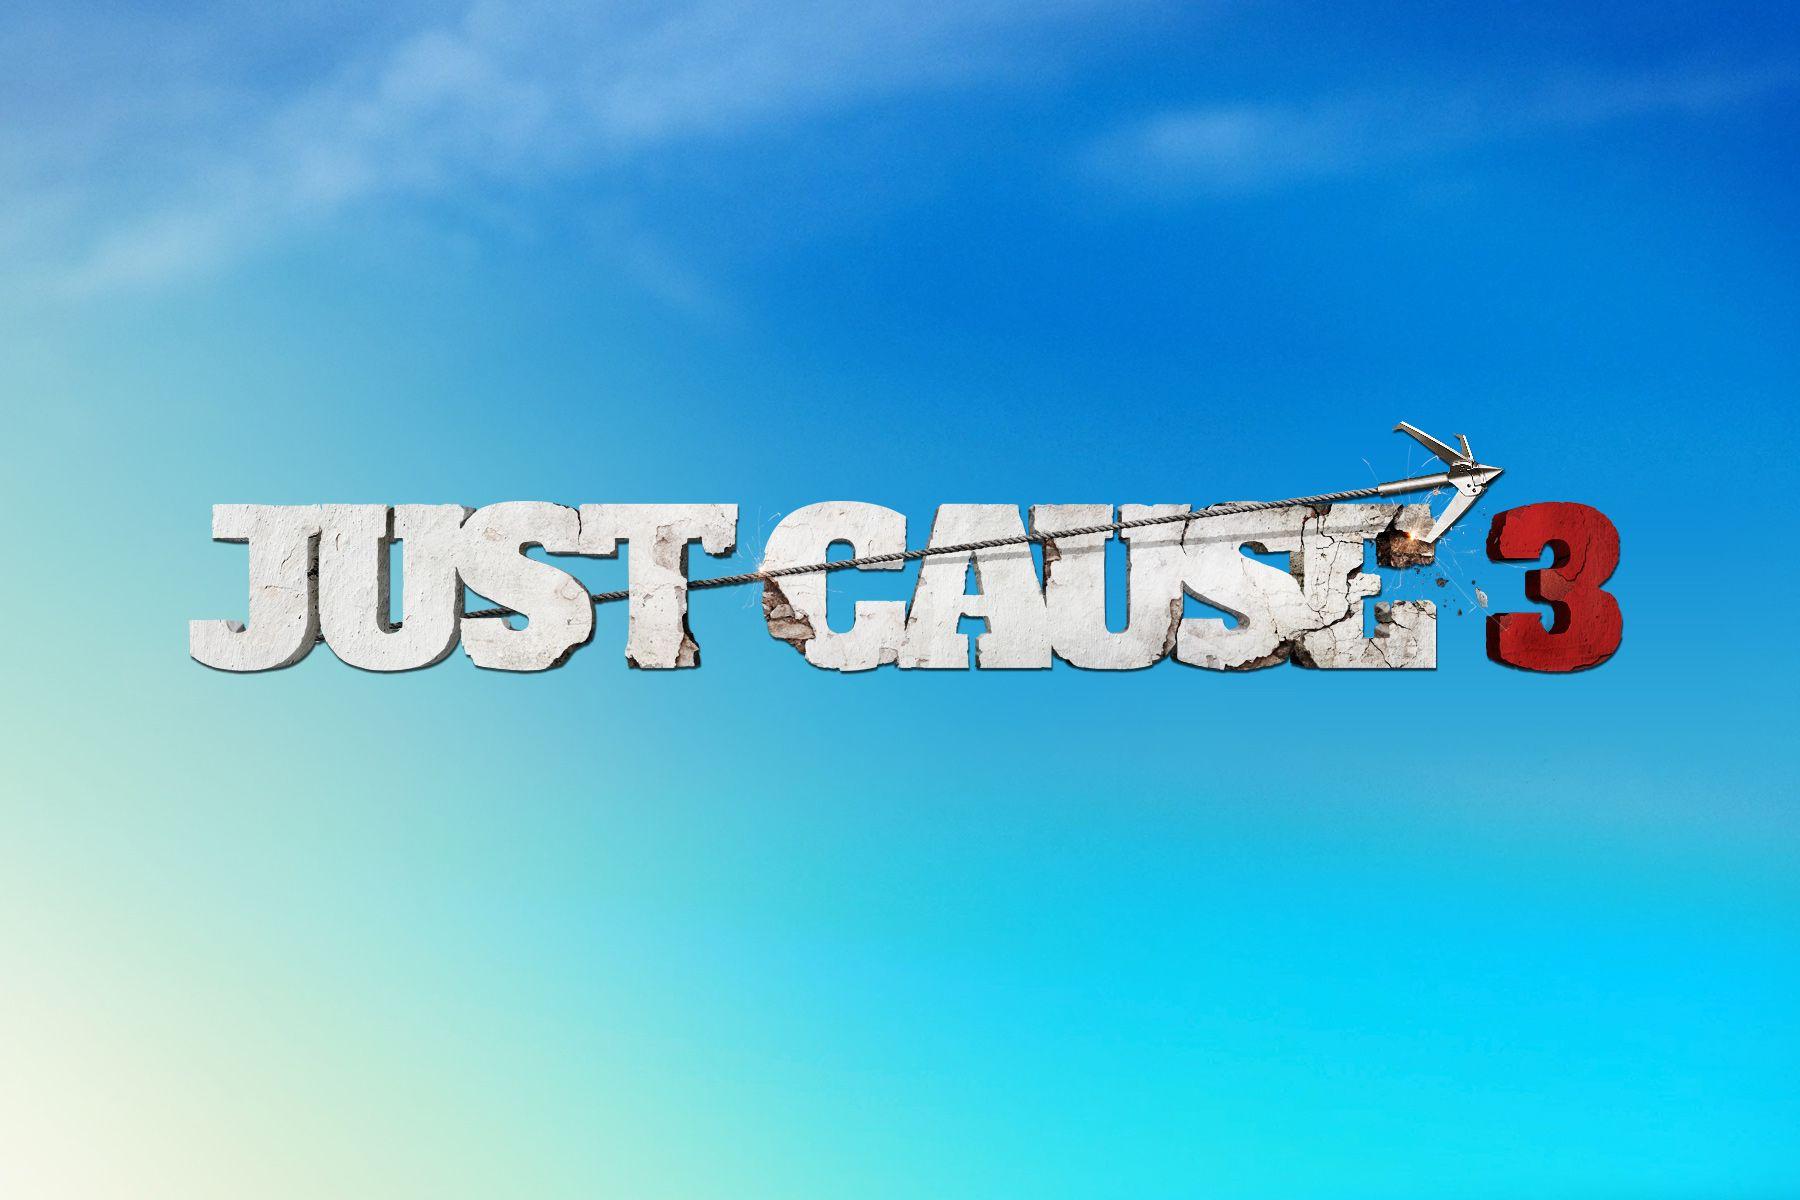 JUSTCAUSE 3